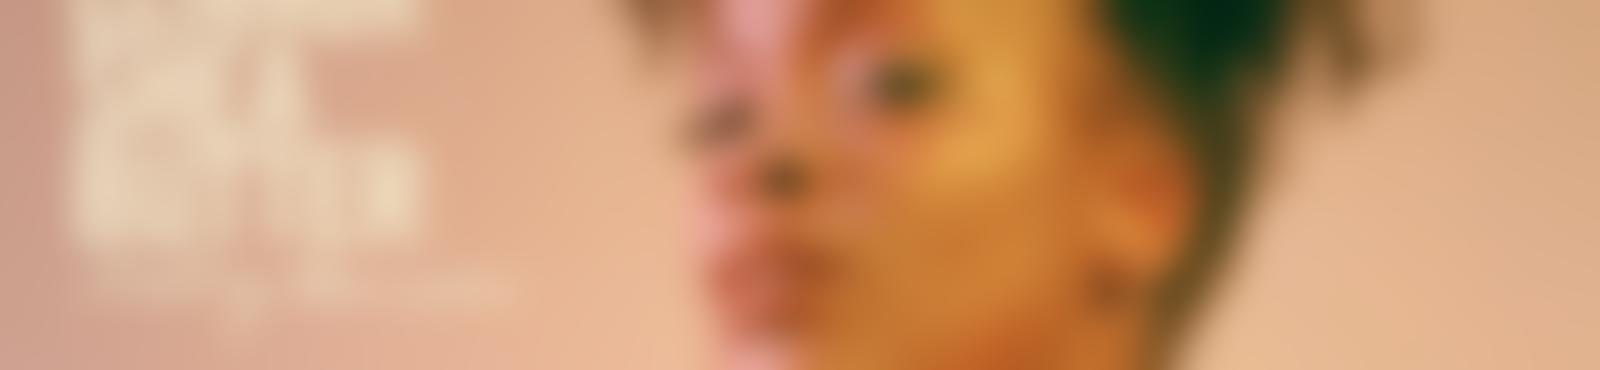 Blurred 10099f8f 9b16 4b58 8af2 c9acc1e51b21